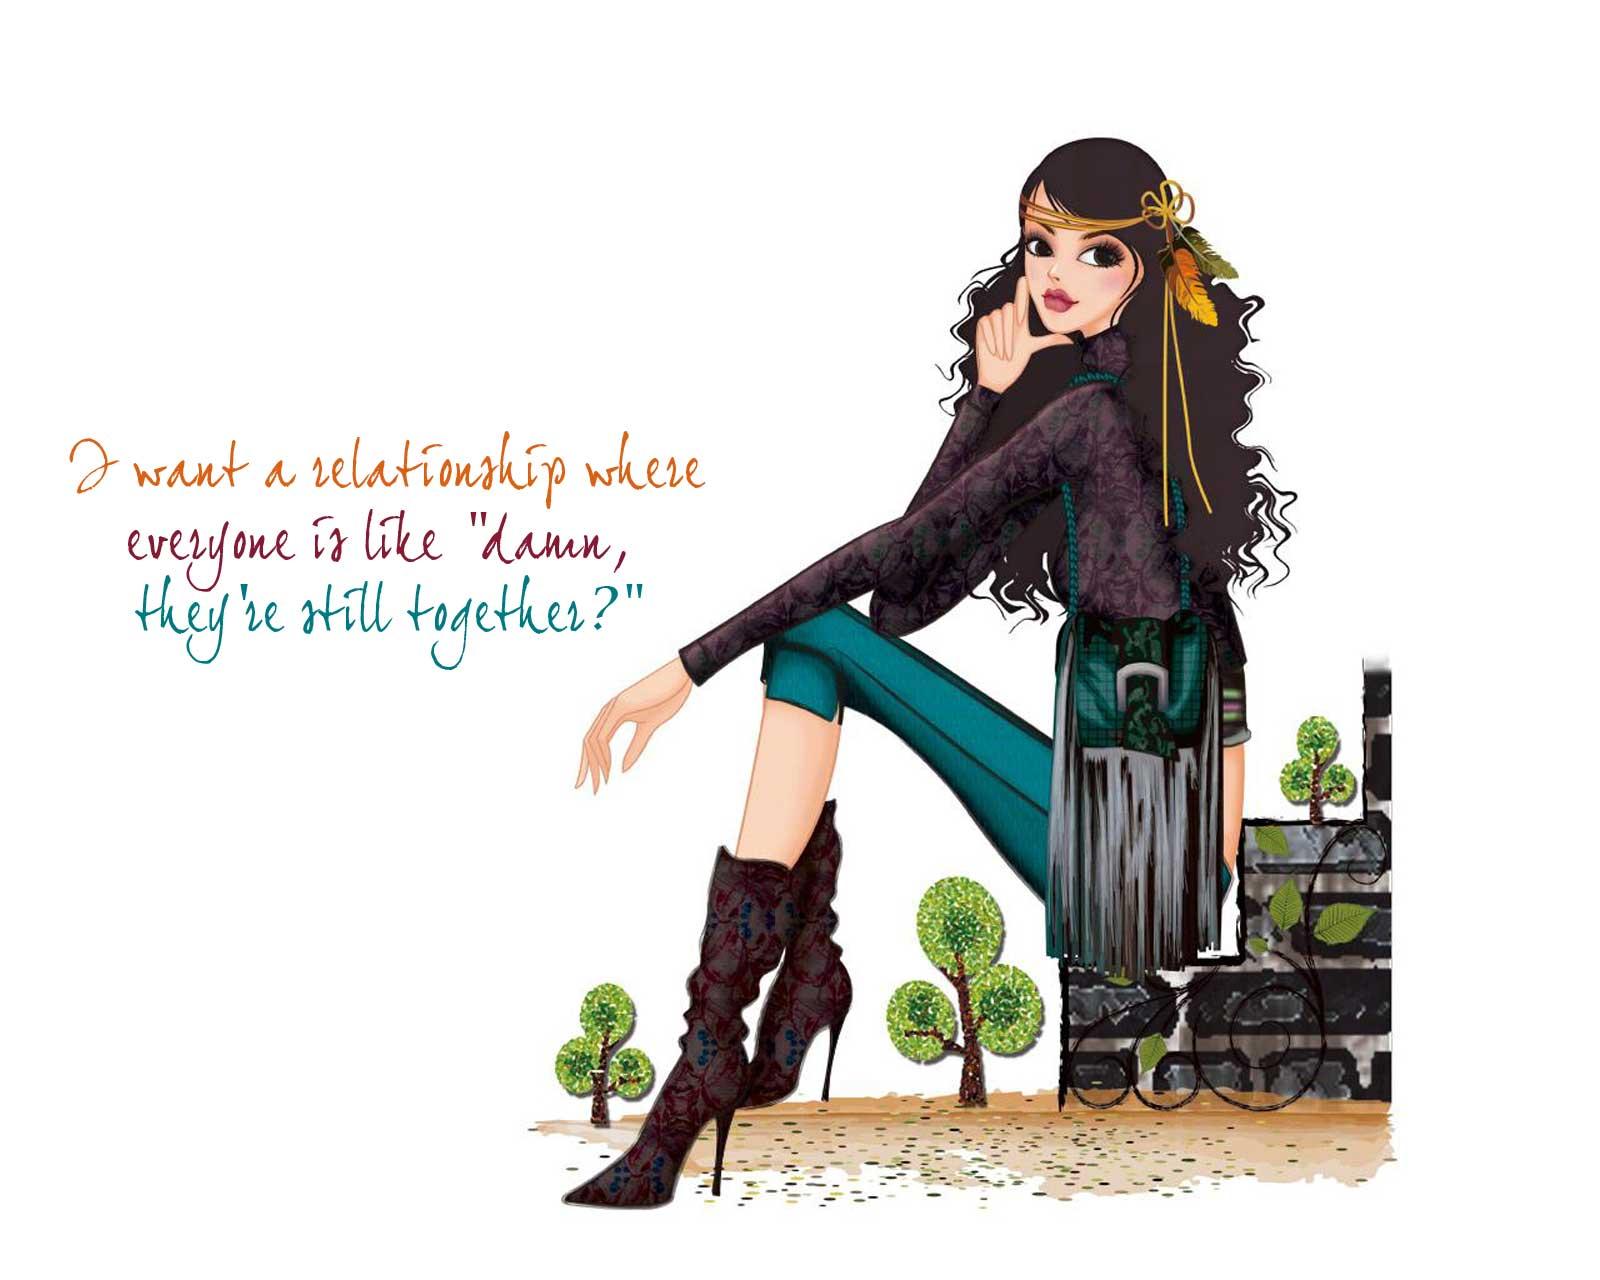 49+] Girl Quotes Wallpaper on WallpaperSafari